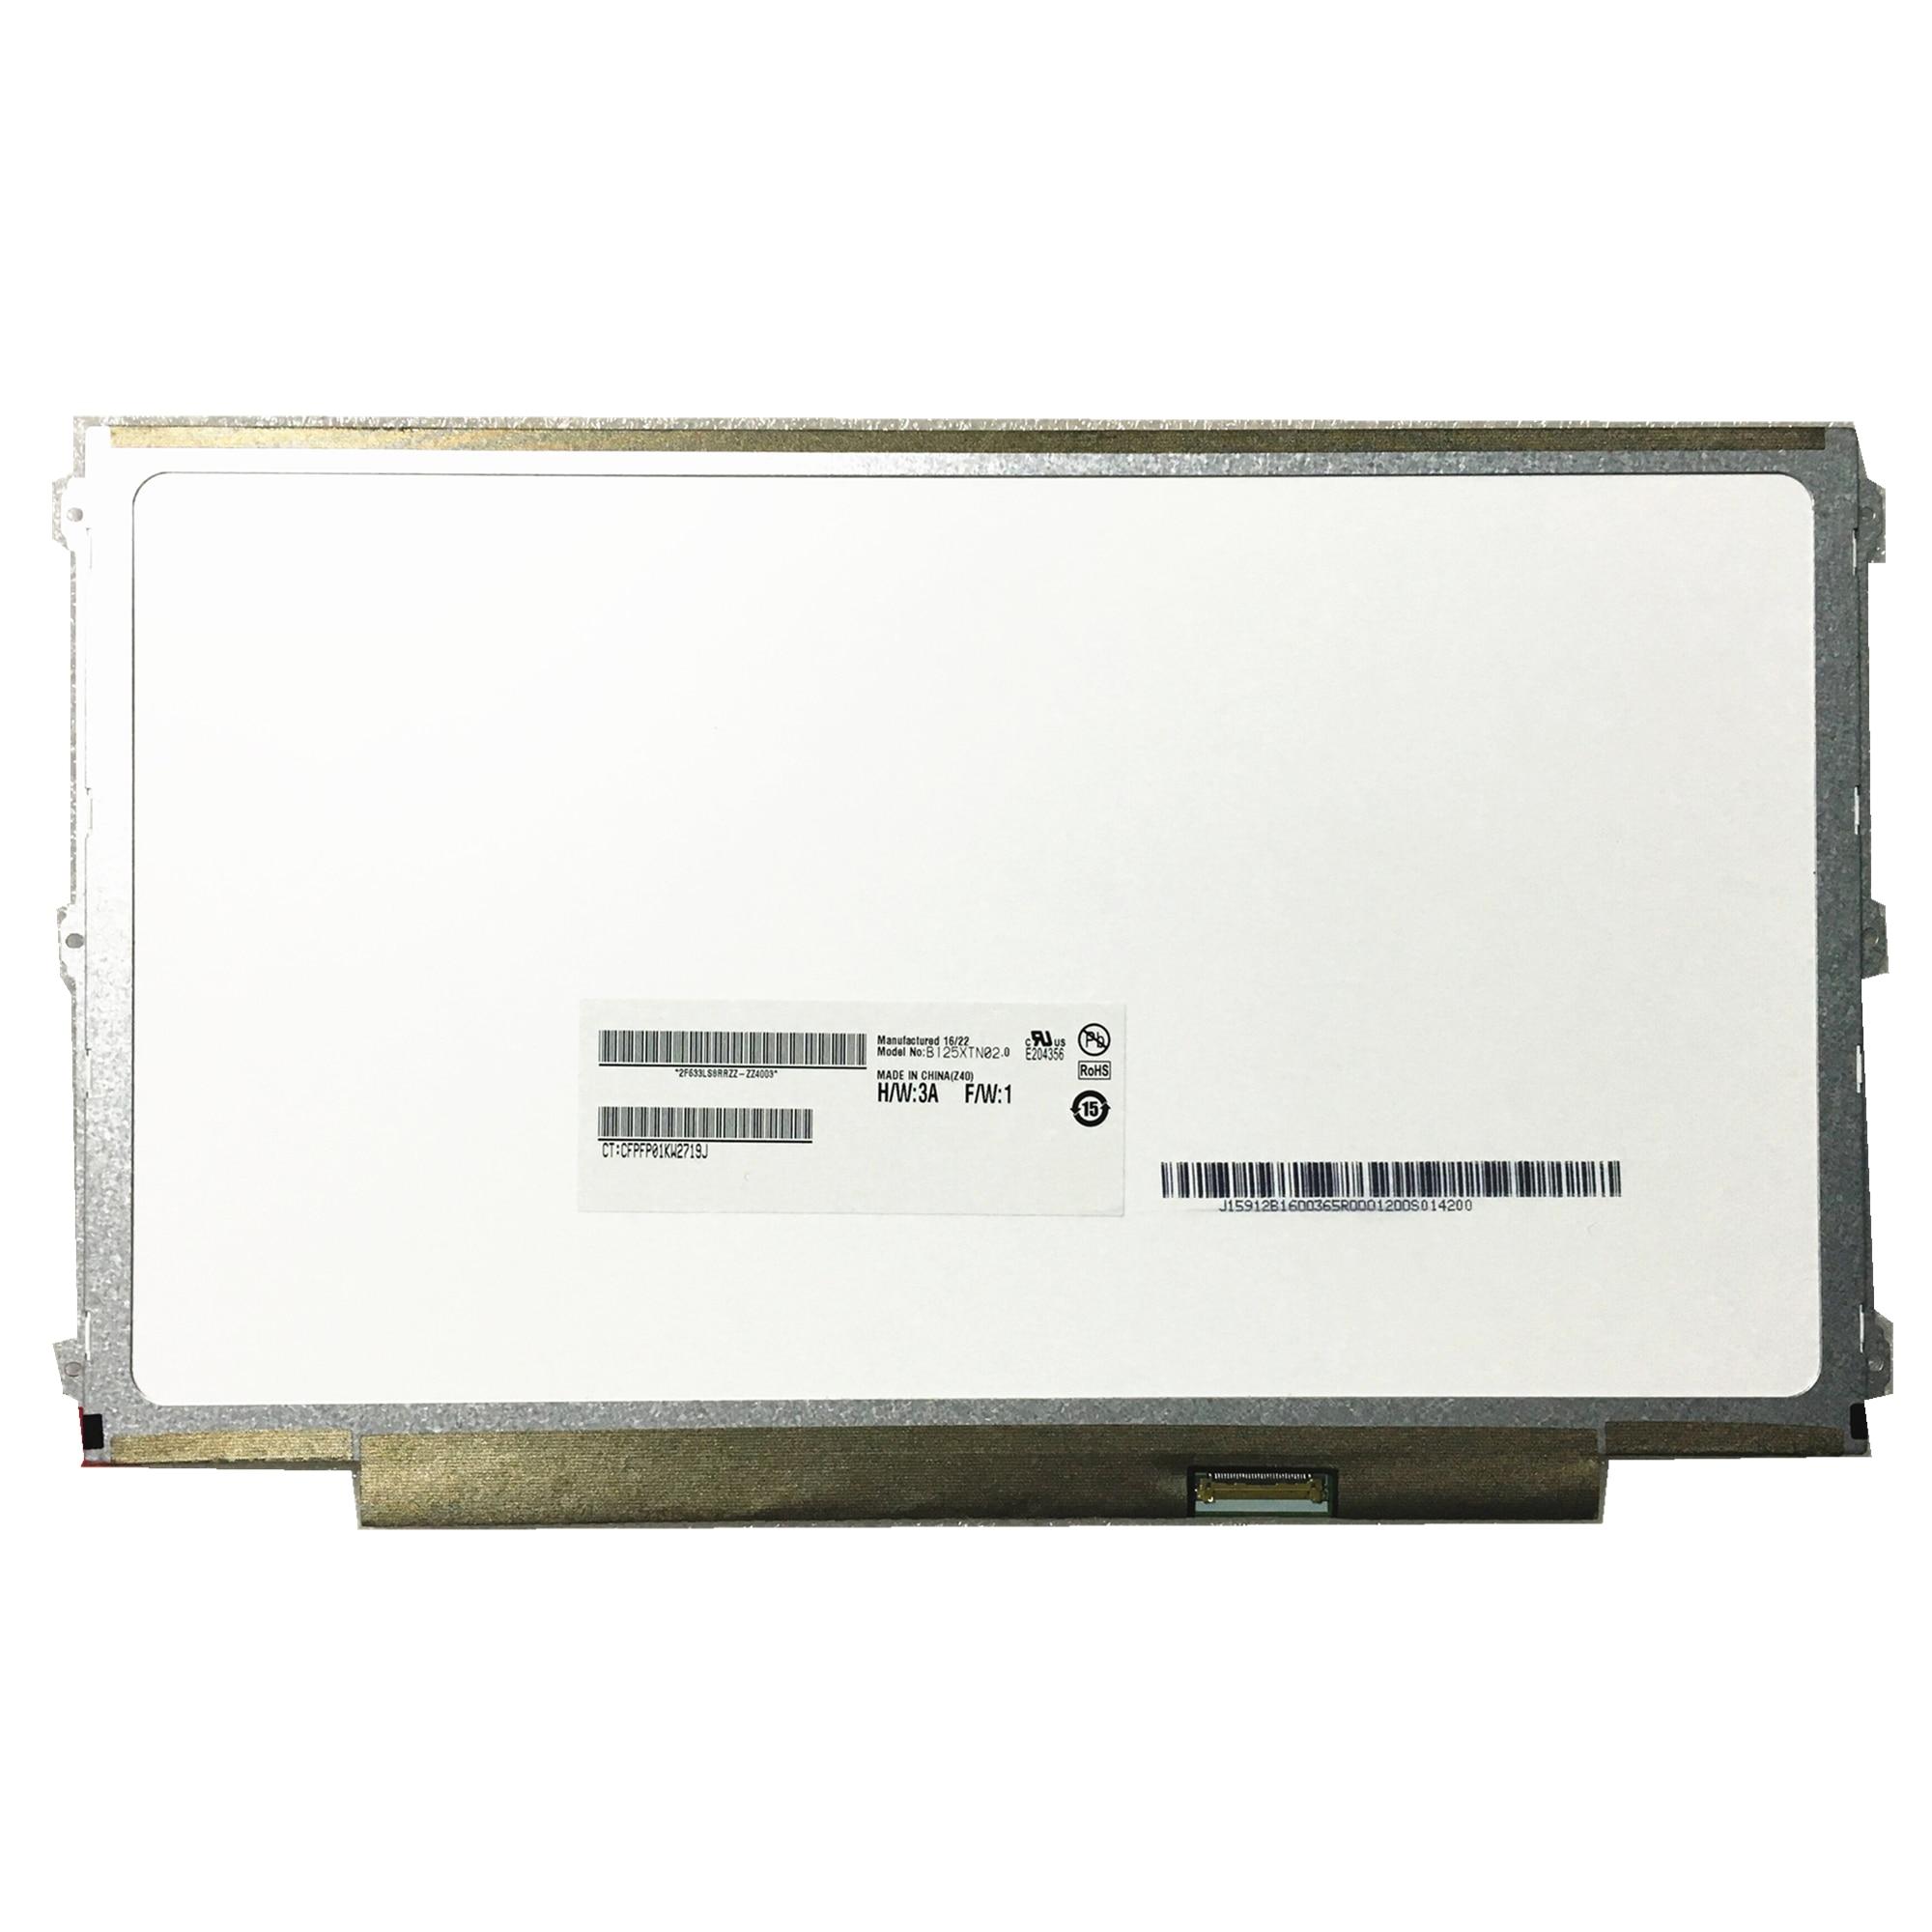 "LENOVO IDEAPAD U260 LAPTOP LCD SCREEN 12.5/"" WXGA HD LED SINGLE"